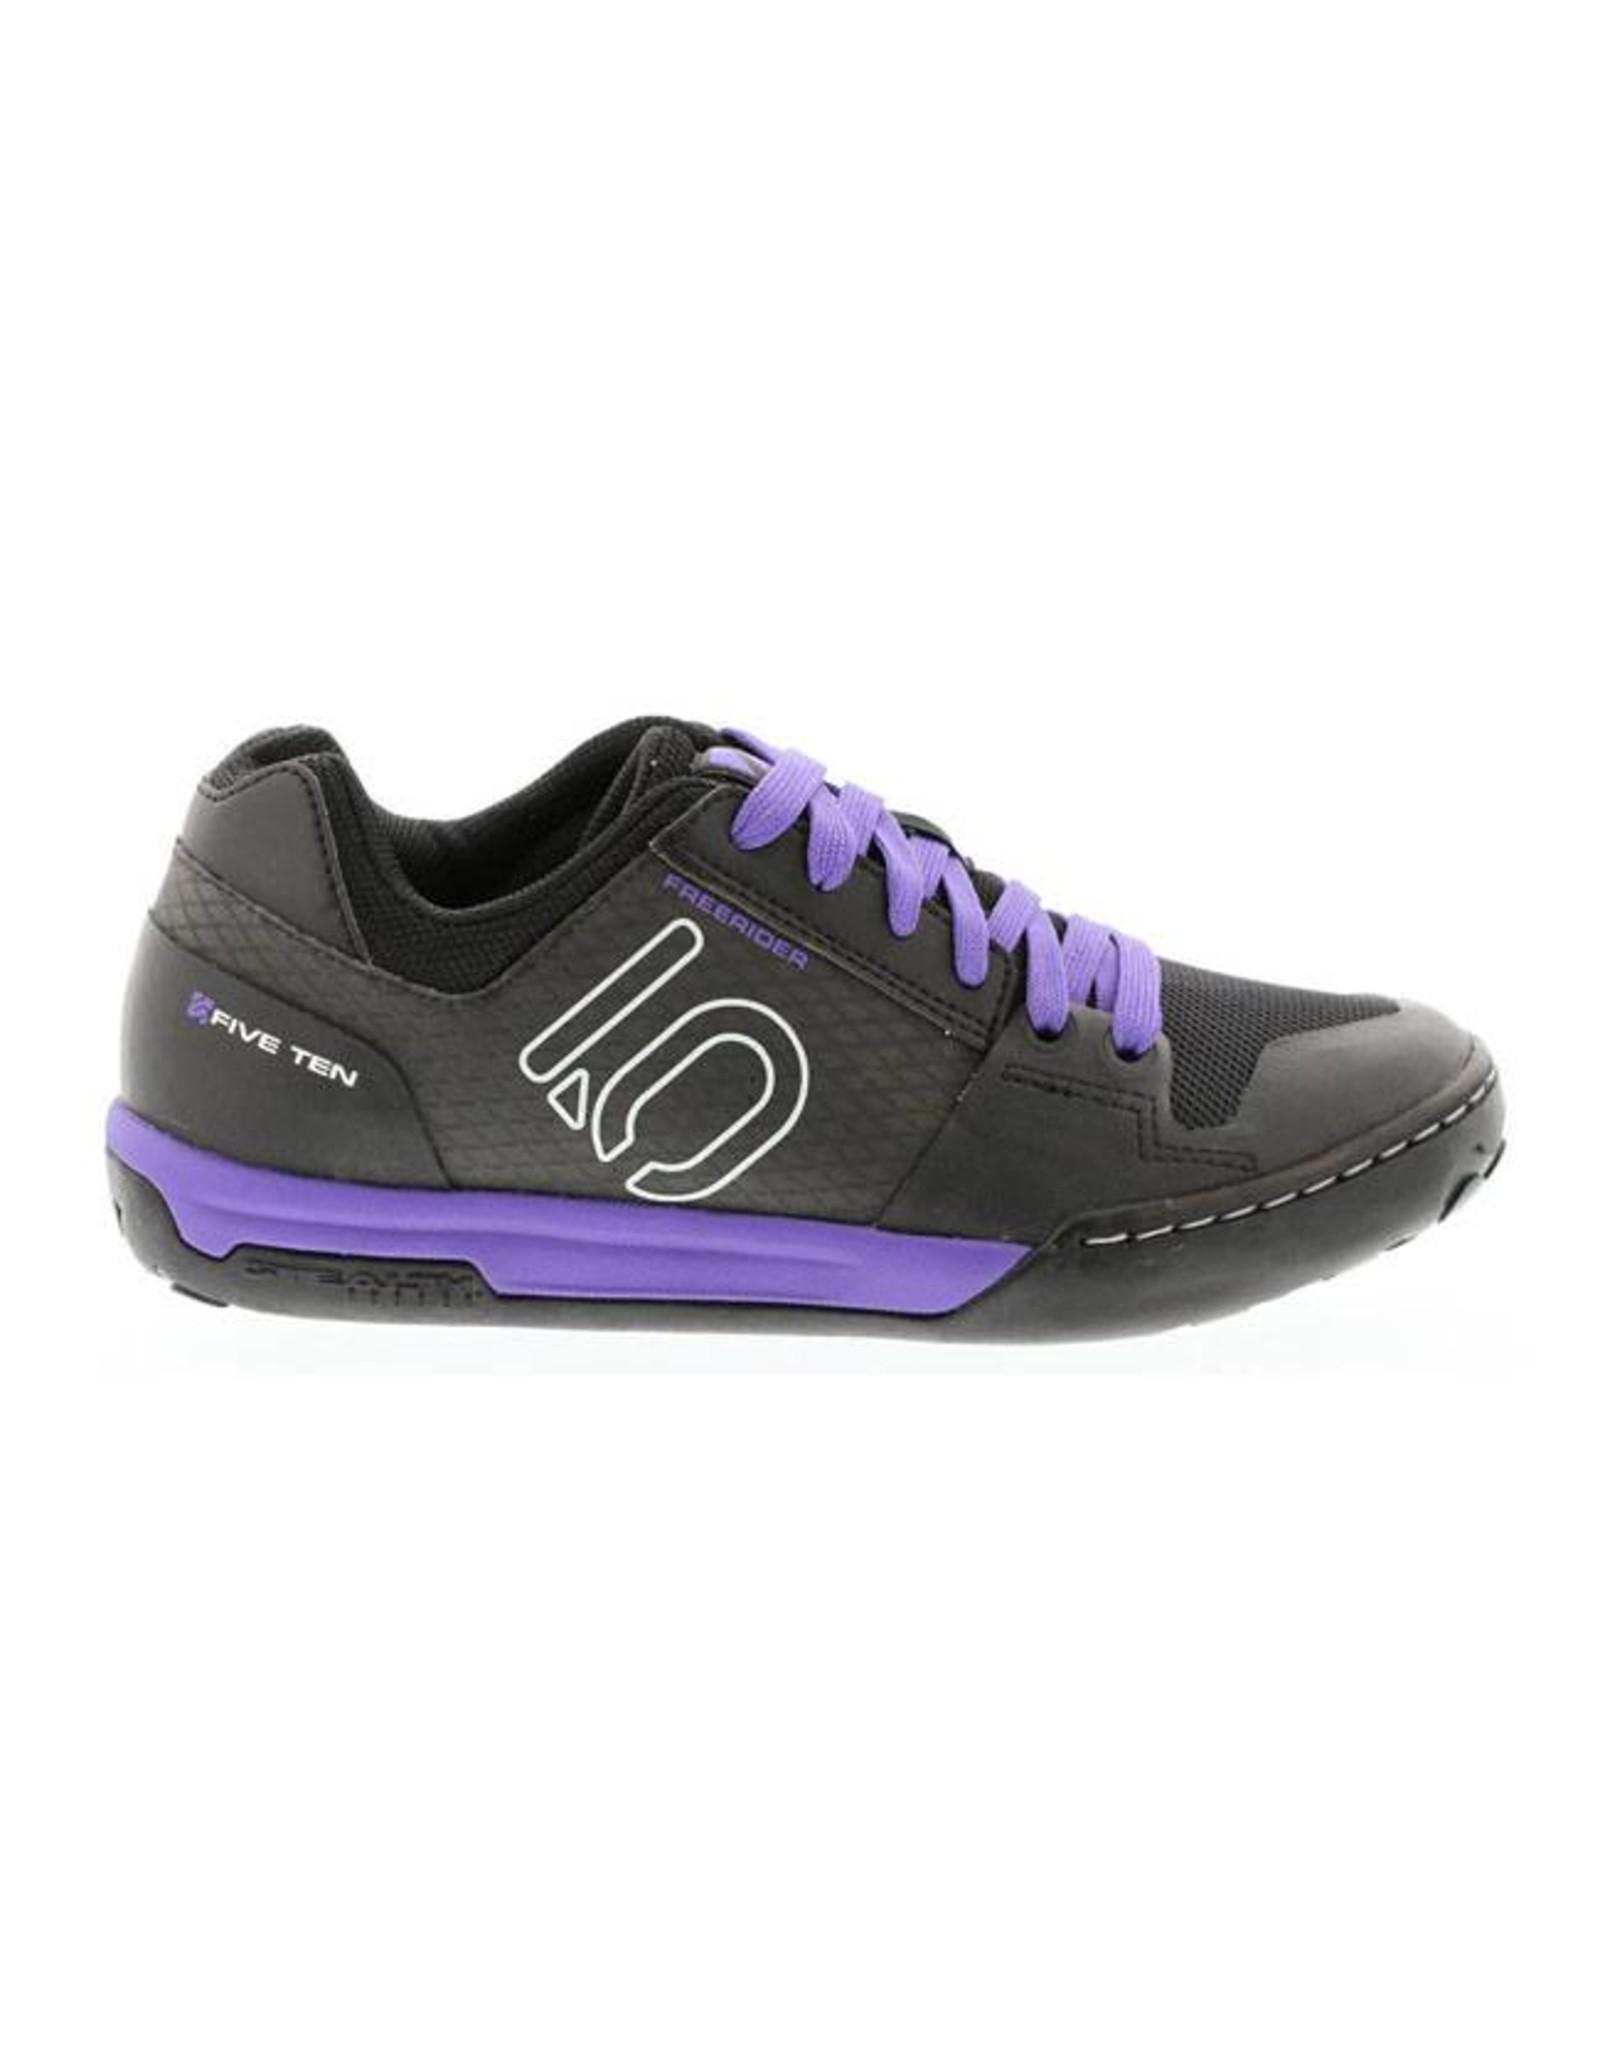 Five Ten Five Ten Freerider Contact Women's Flat Pedal Shoe: Split Purple 6